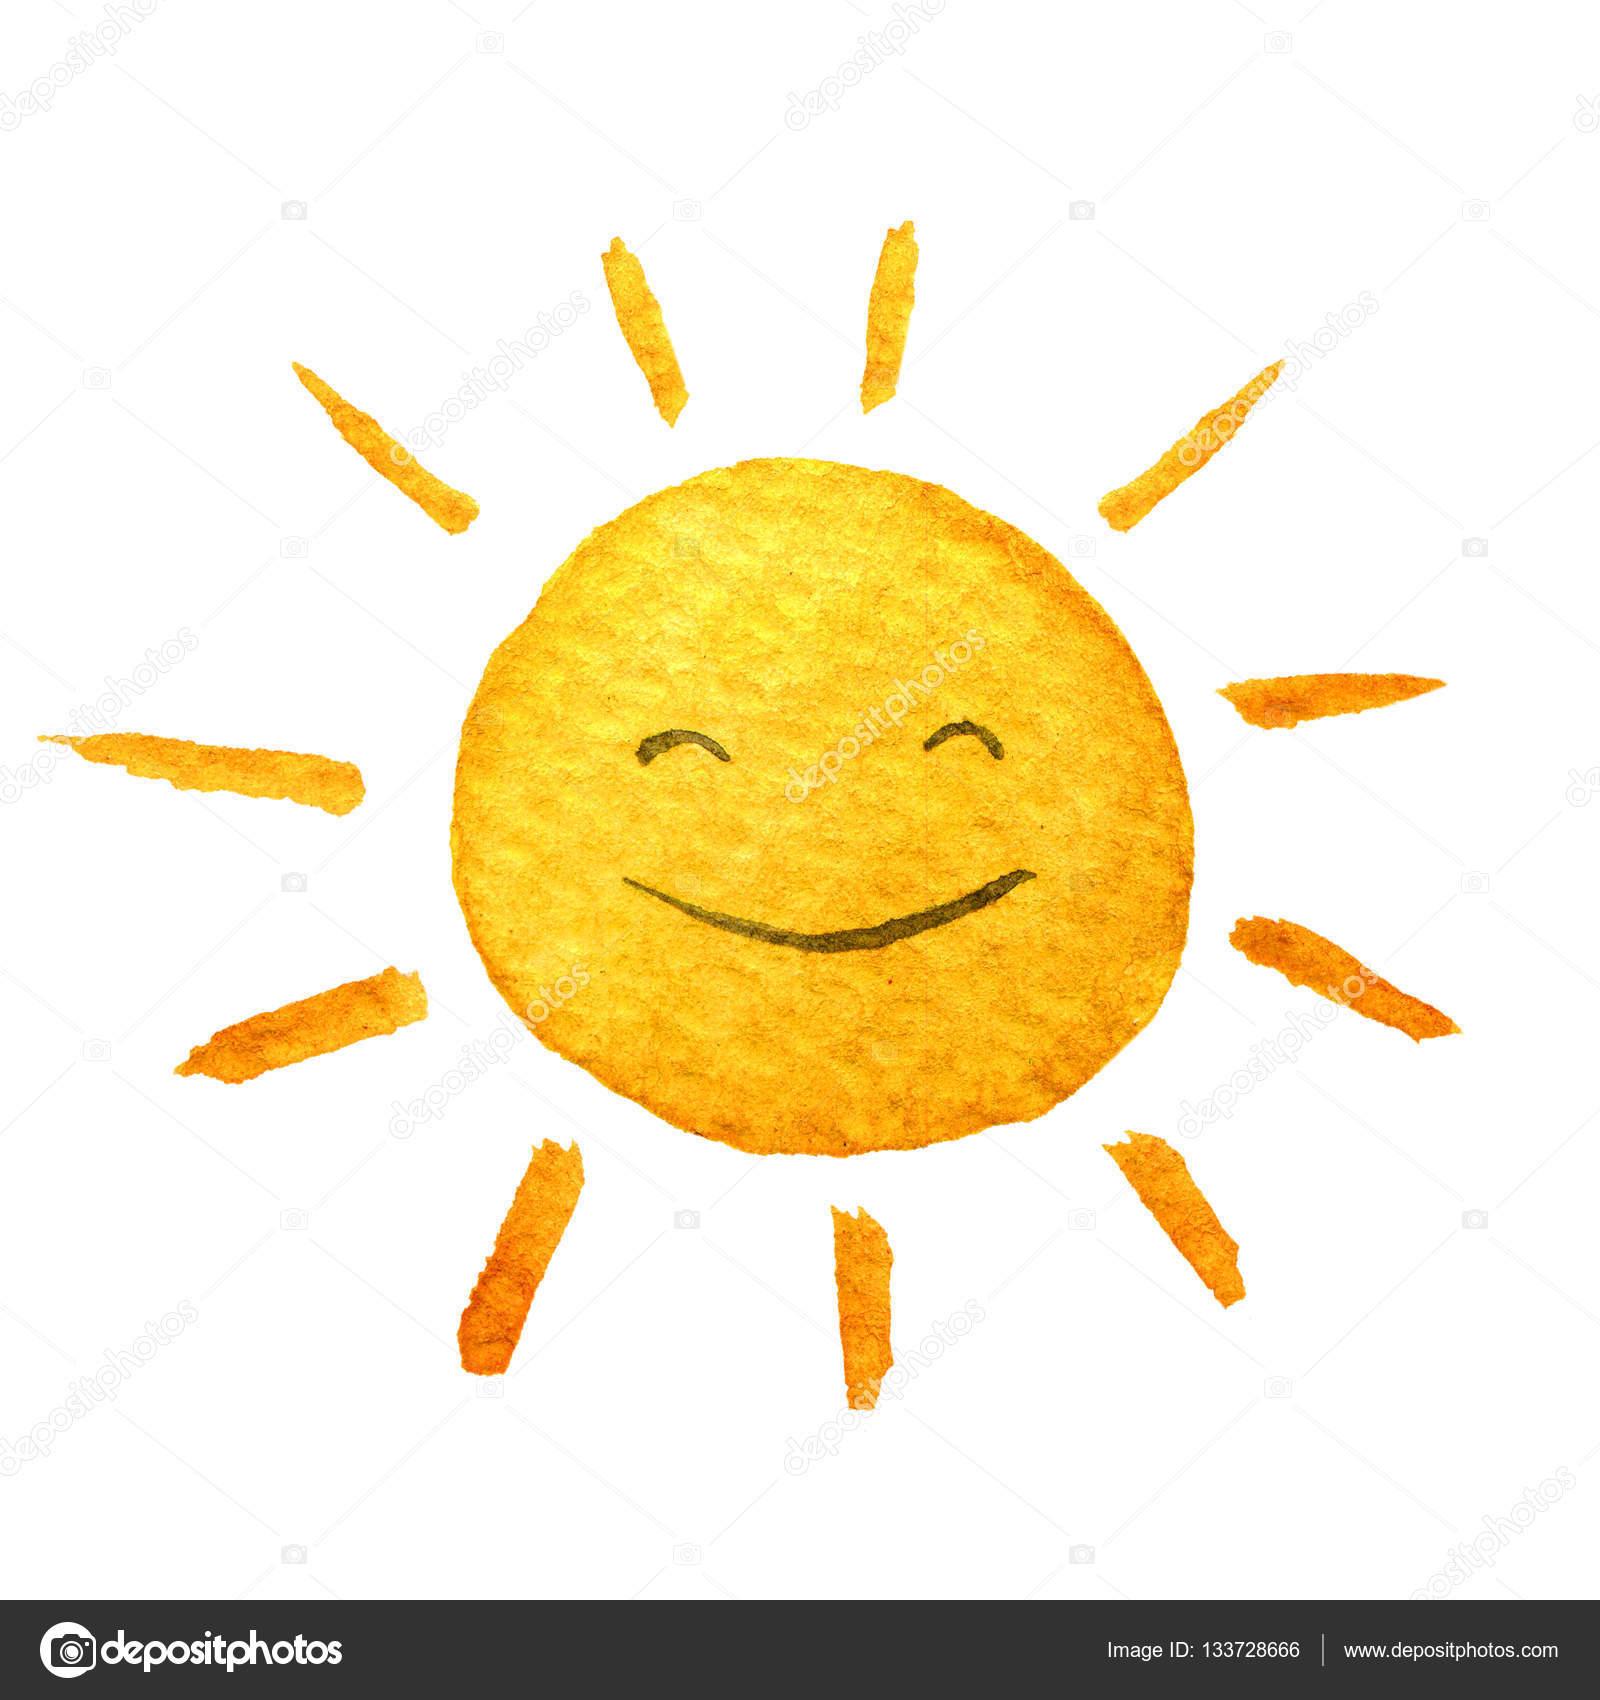 1600x1700 Cute Cartoon Sunshine. Hand Drawn Watercolor Illustration Smiling